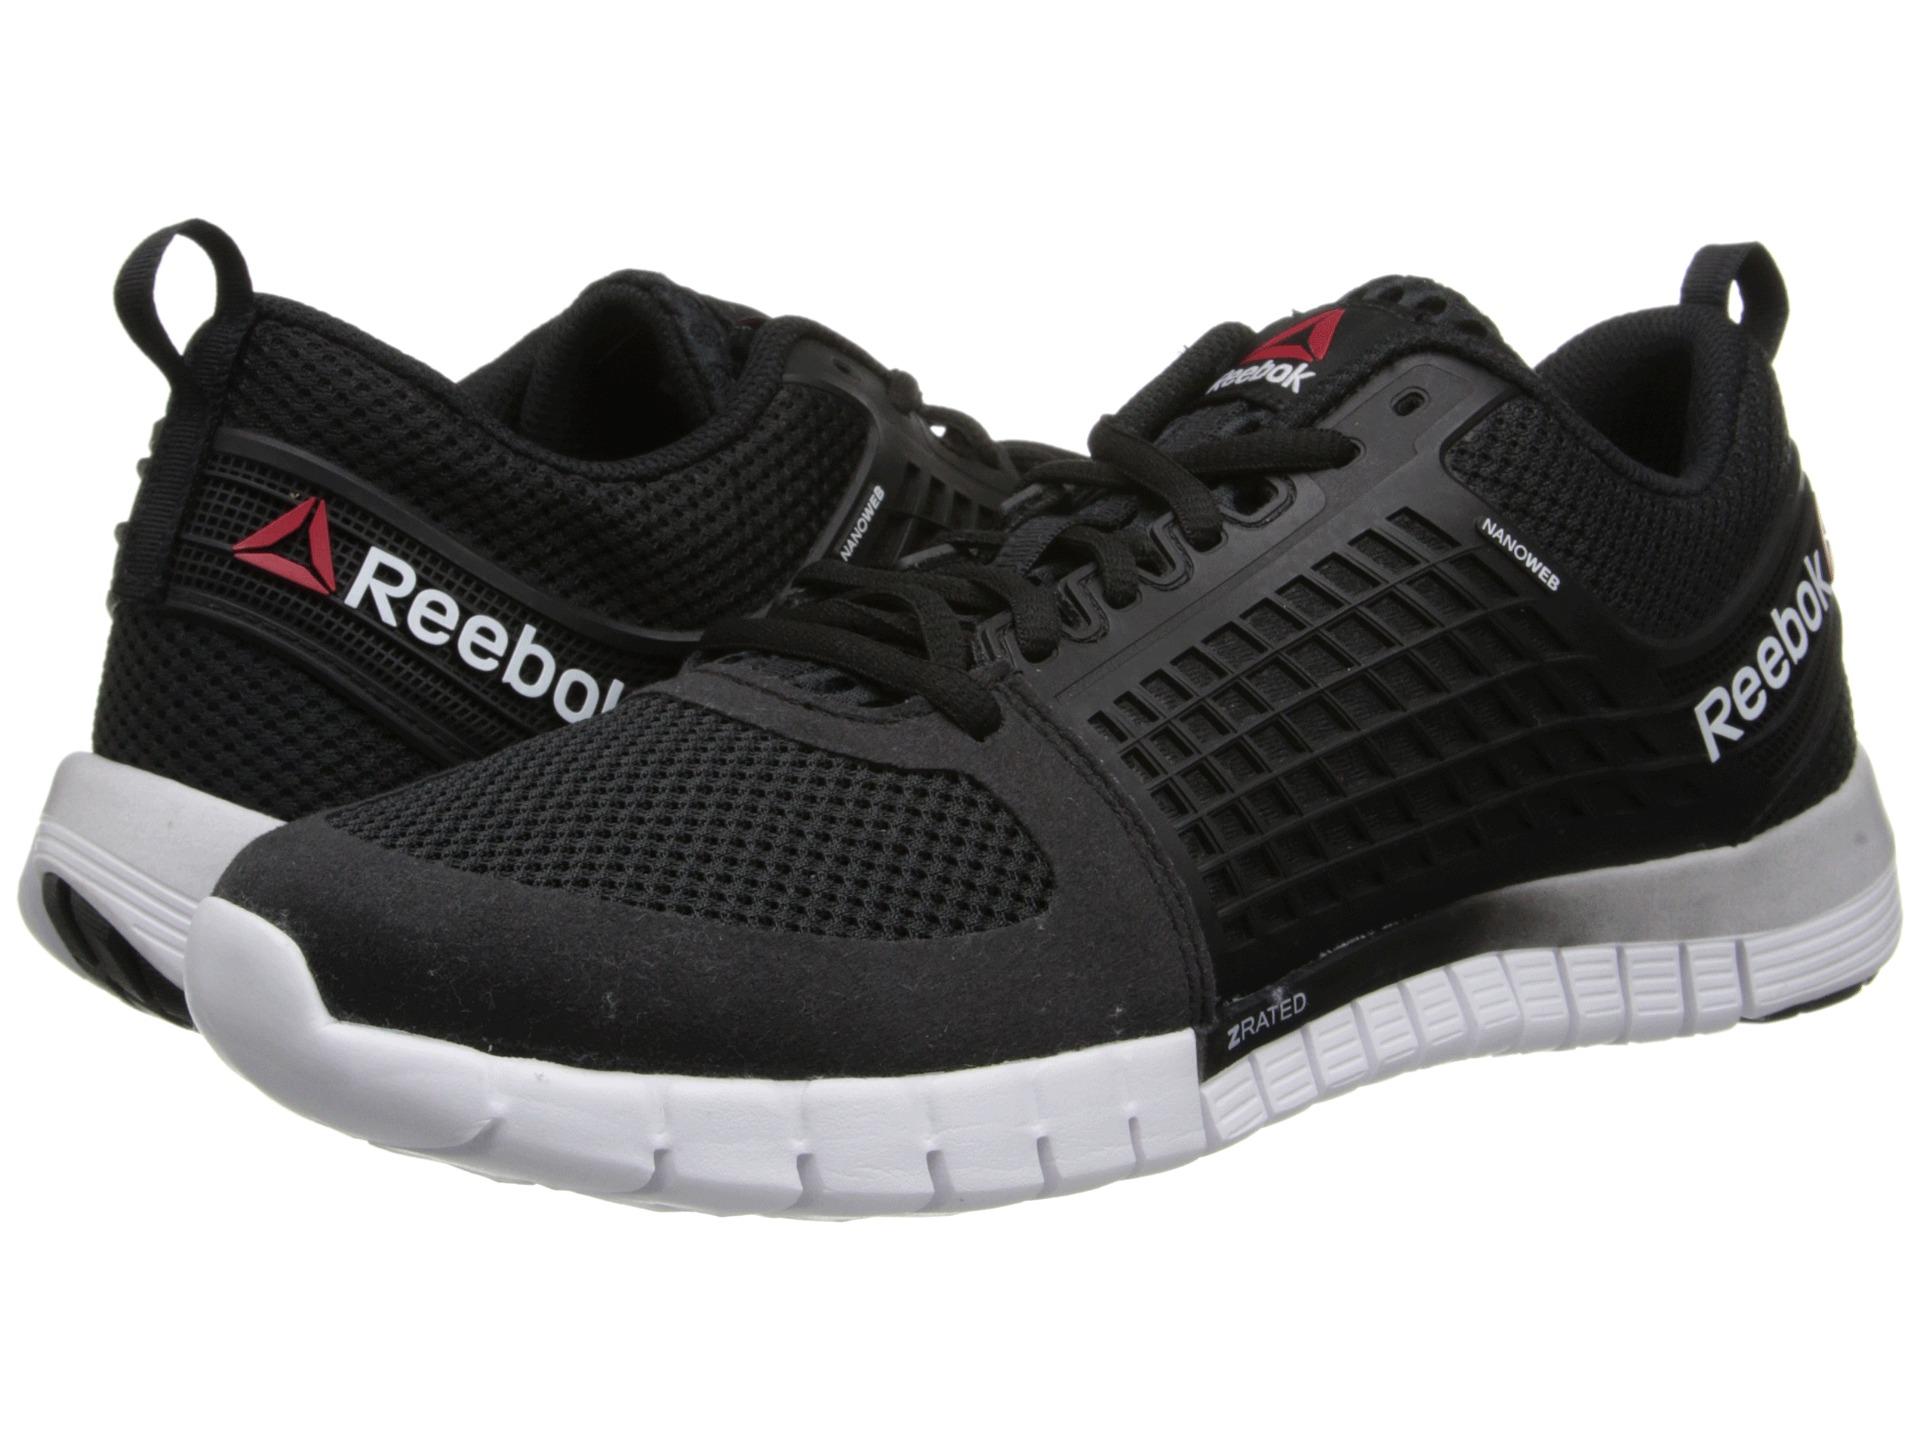 Reebok Z Quick Running Shoes Black Steel White